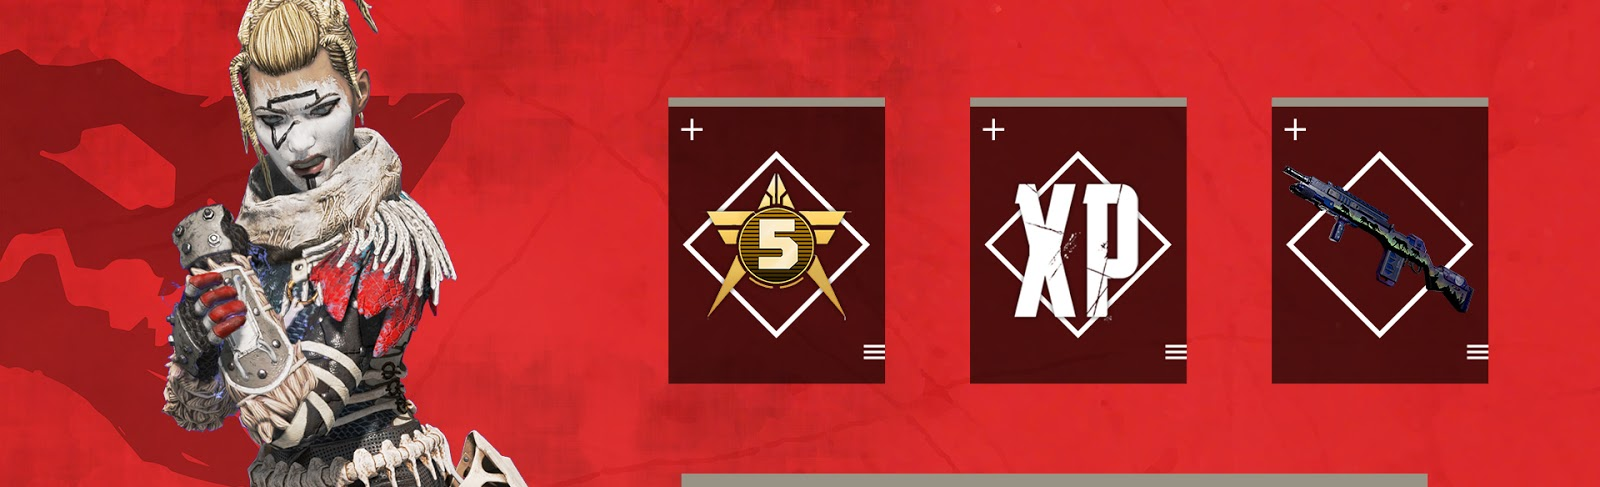 Apex Legends – June 4 Game Update 1 2 and Legendary Hunt Event